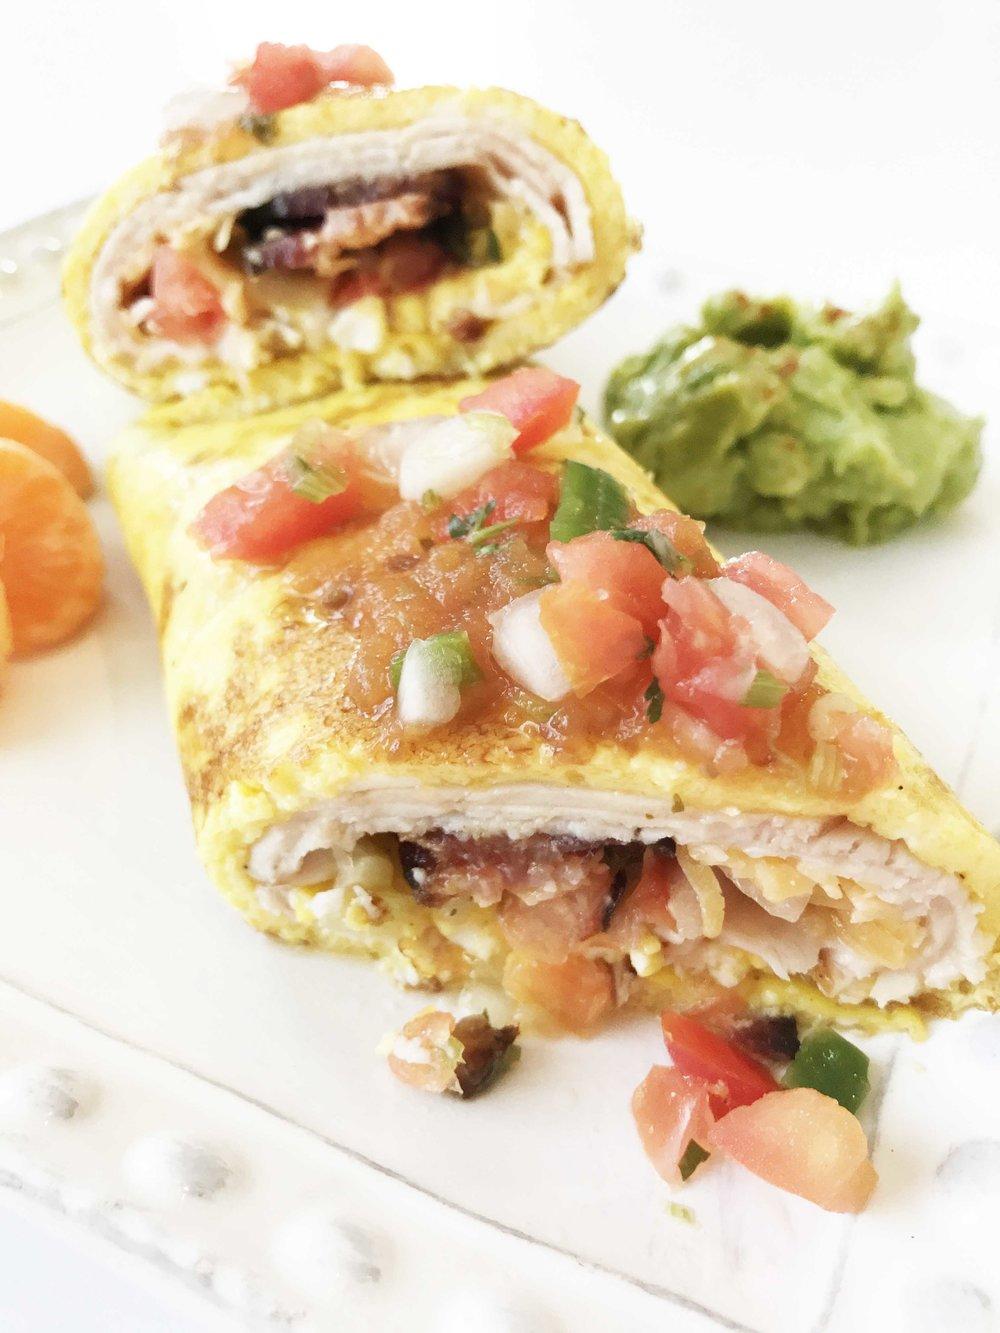 low-carb-breakfast-burrito8.jpg